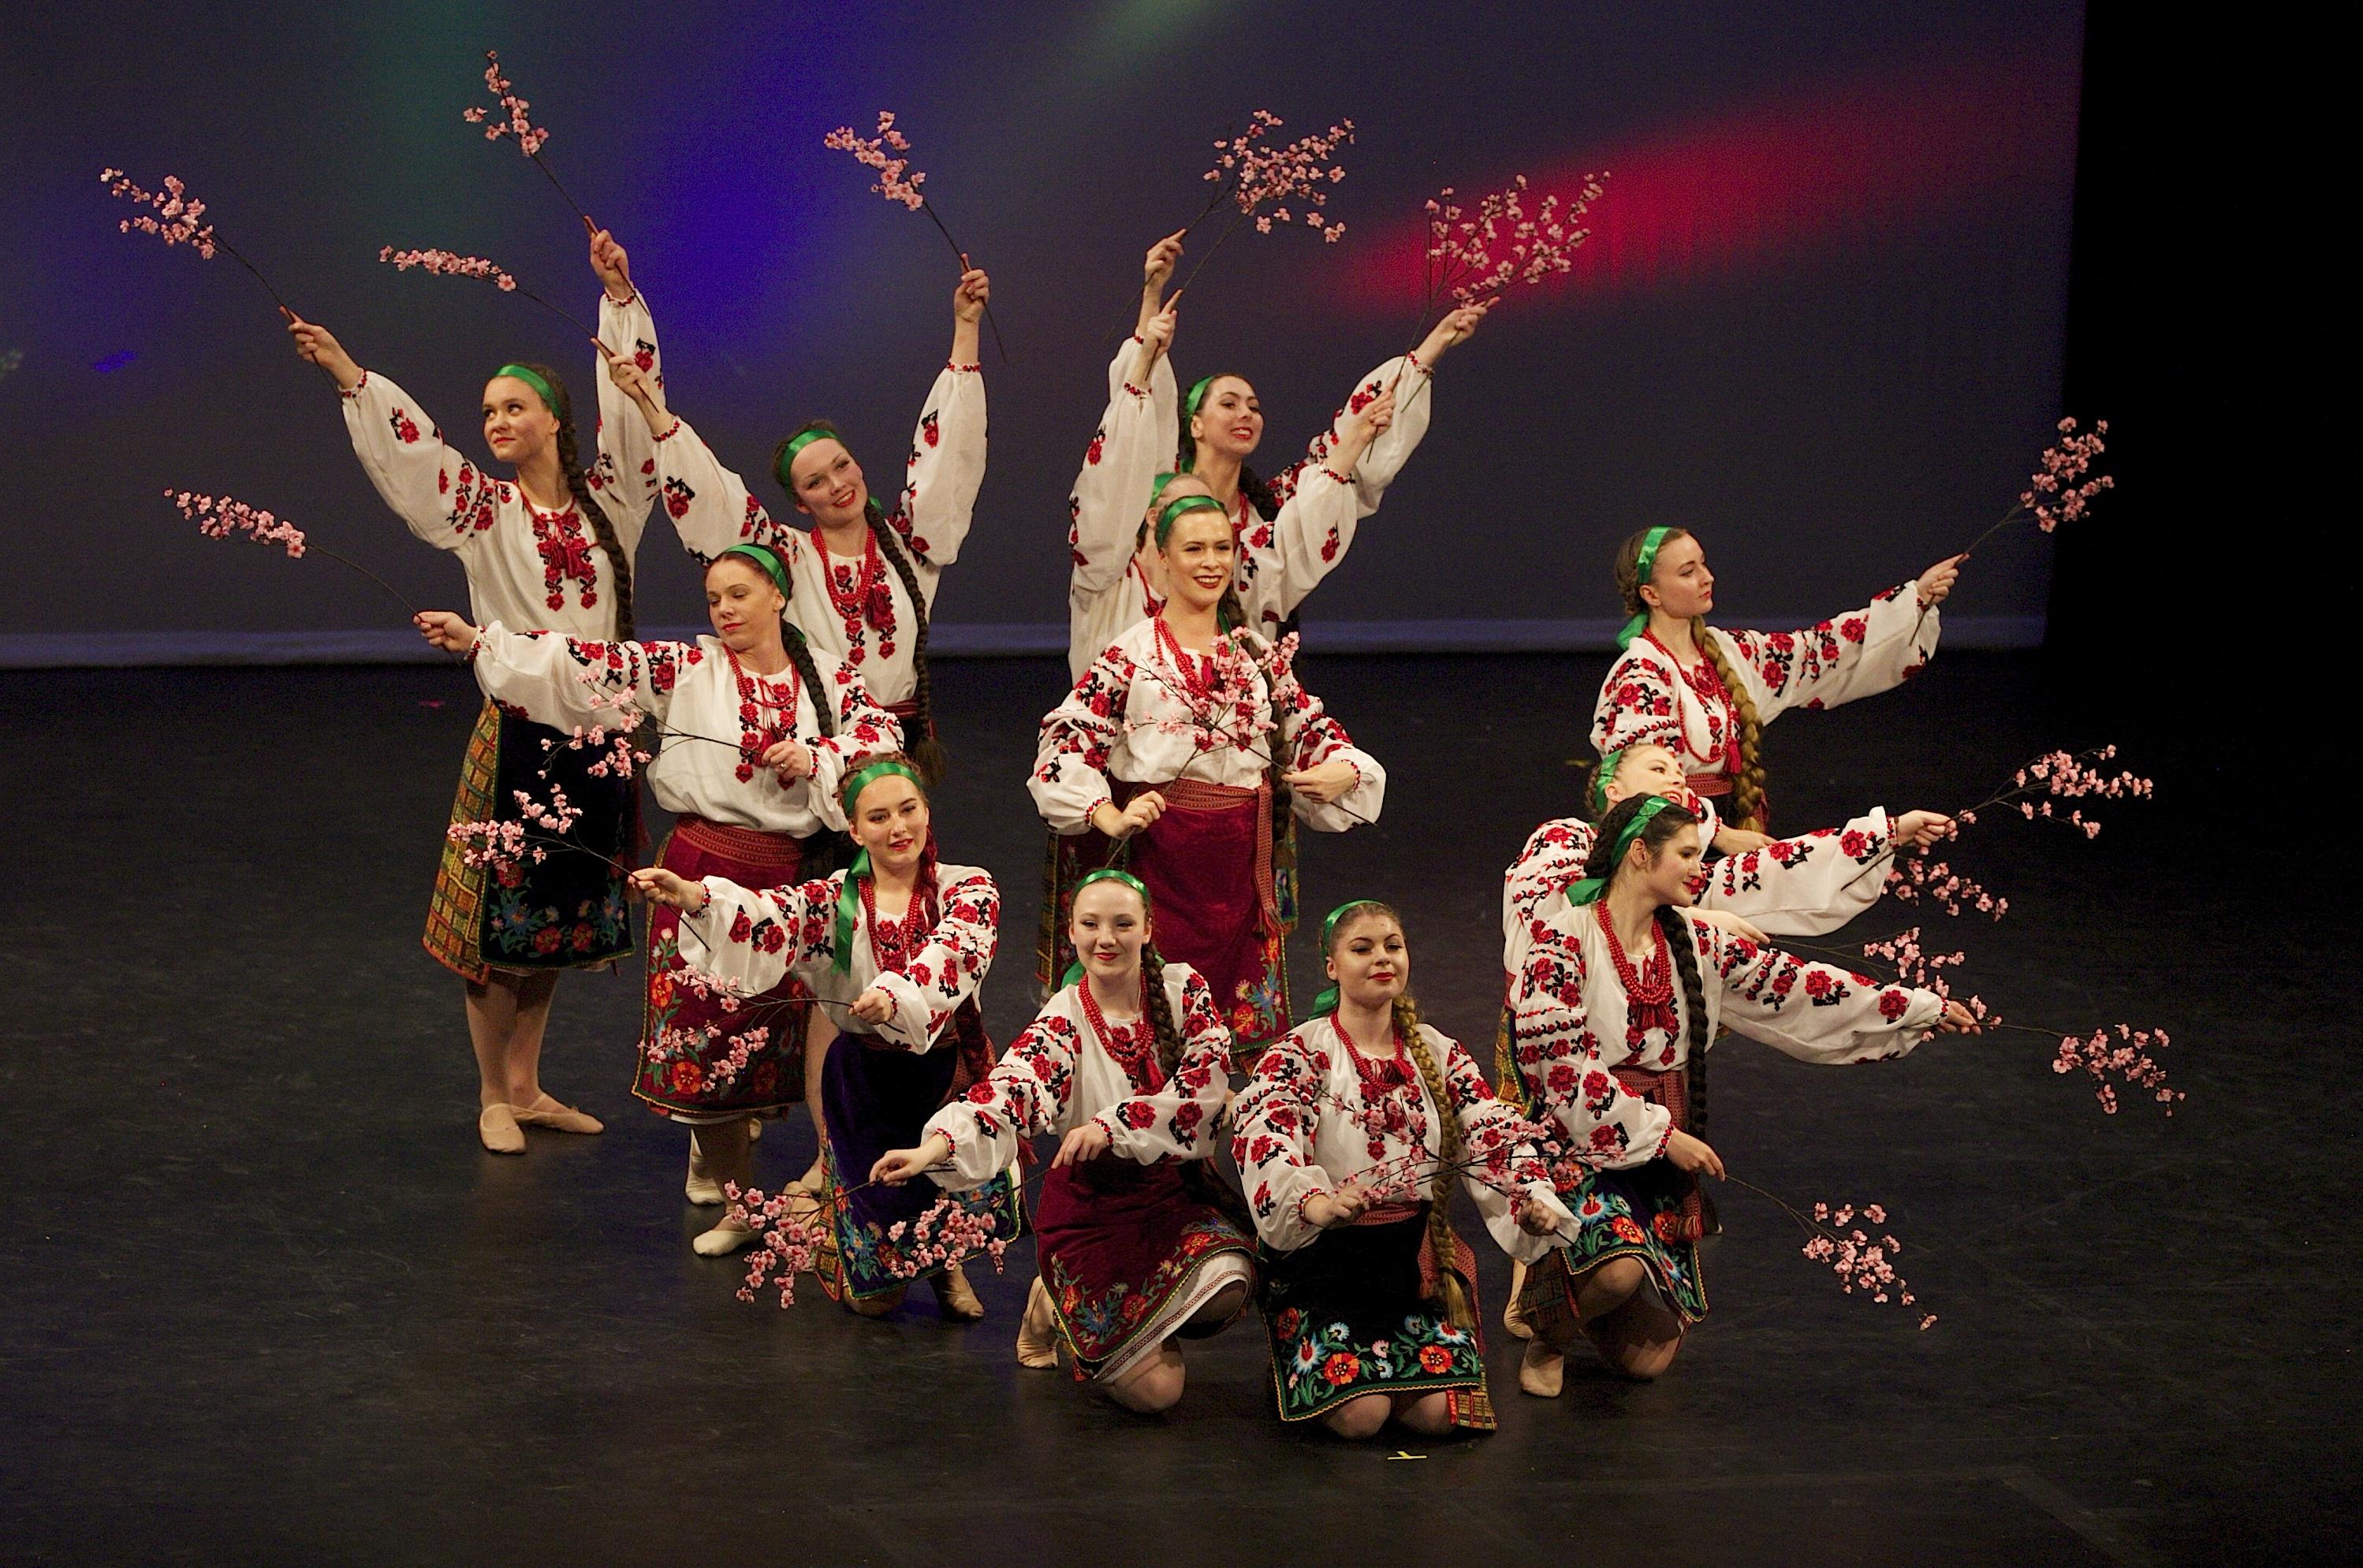 jeunes belles femmes ukrainiennes danse